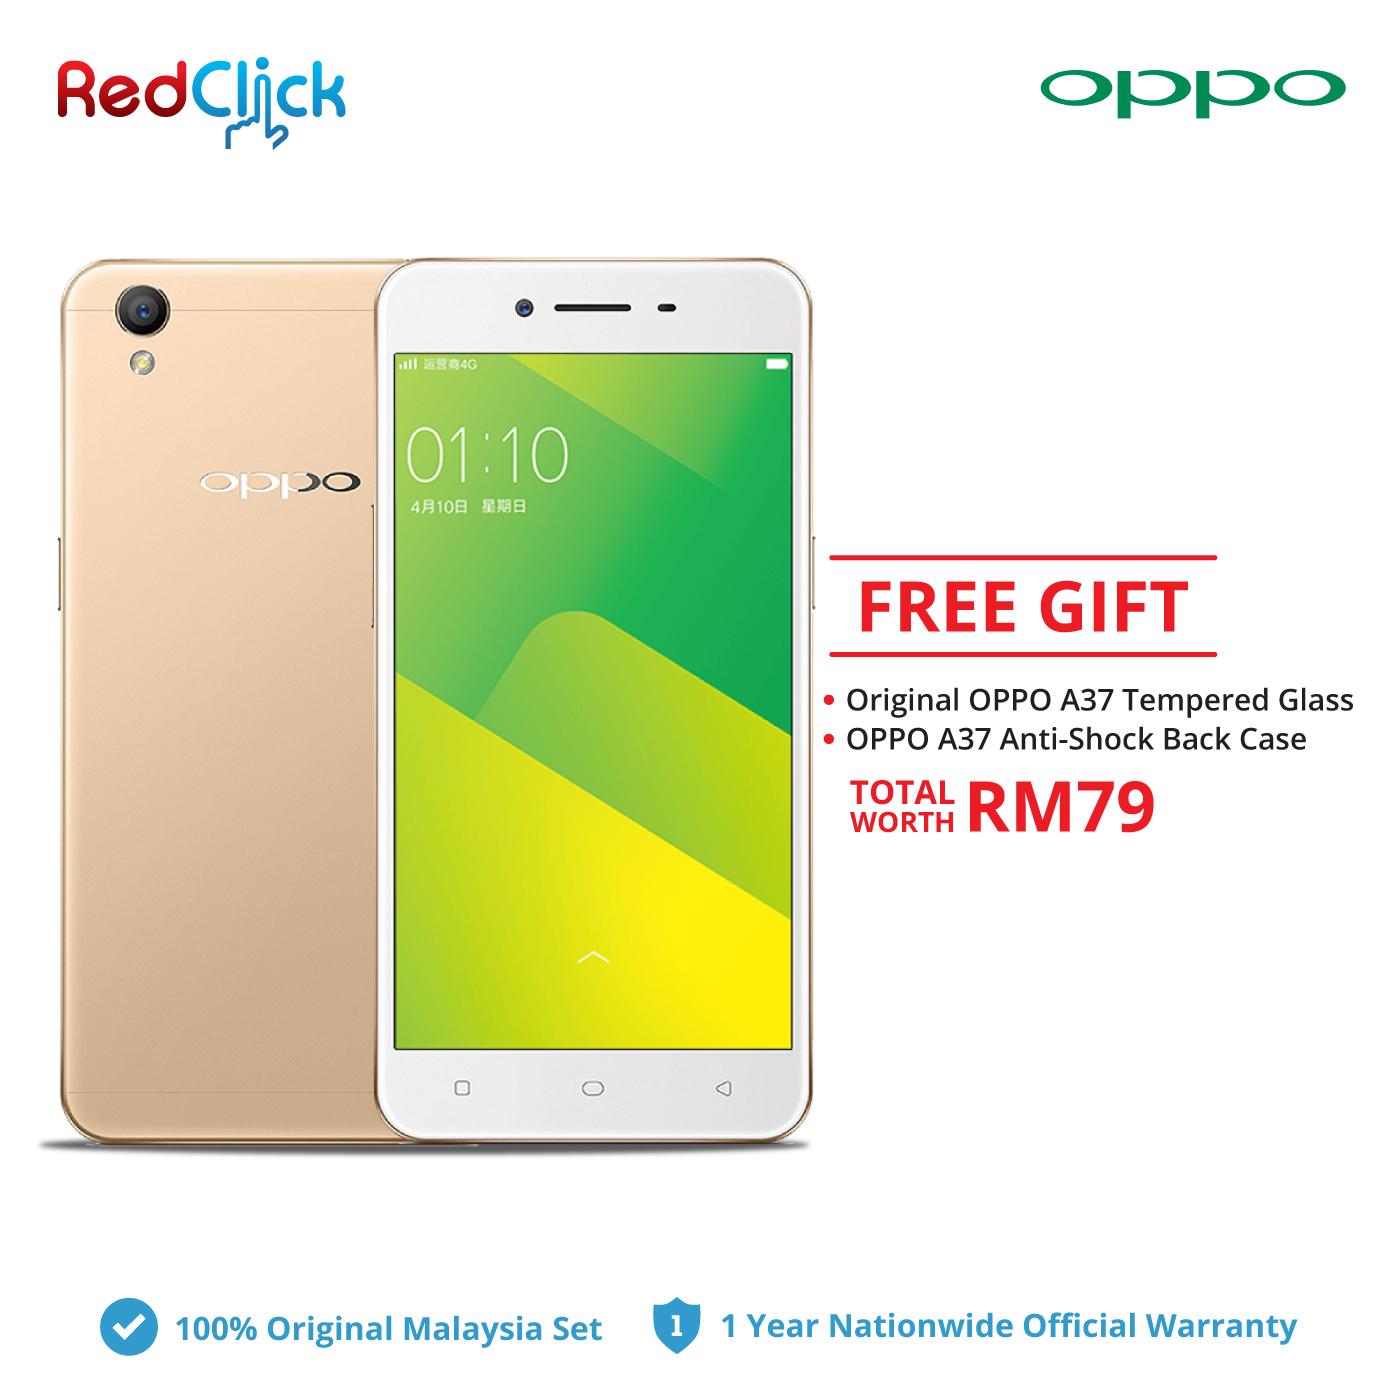 Oppo A37 2 16gb Free 7 Item Accessories Daftar Harga Terlengkap Rosegold 16 Gb 1000 2gb